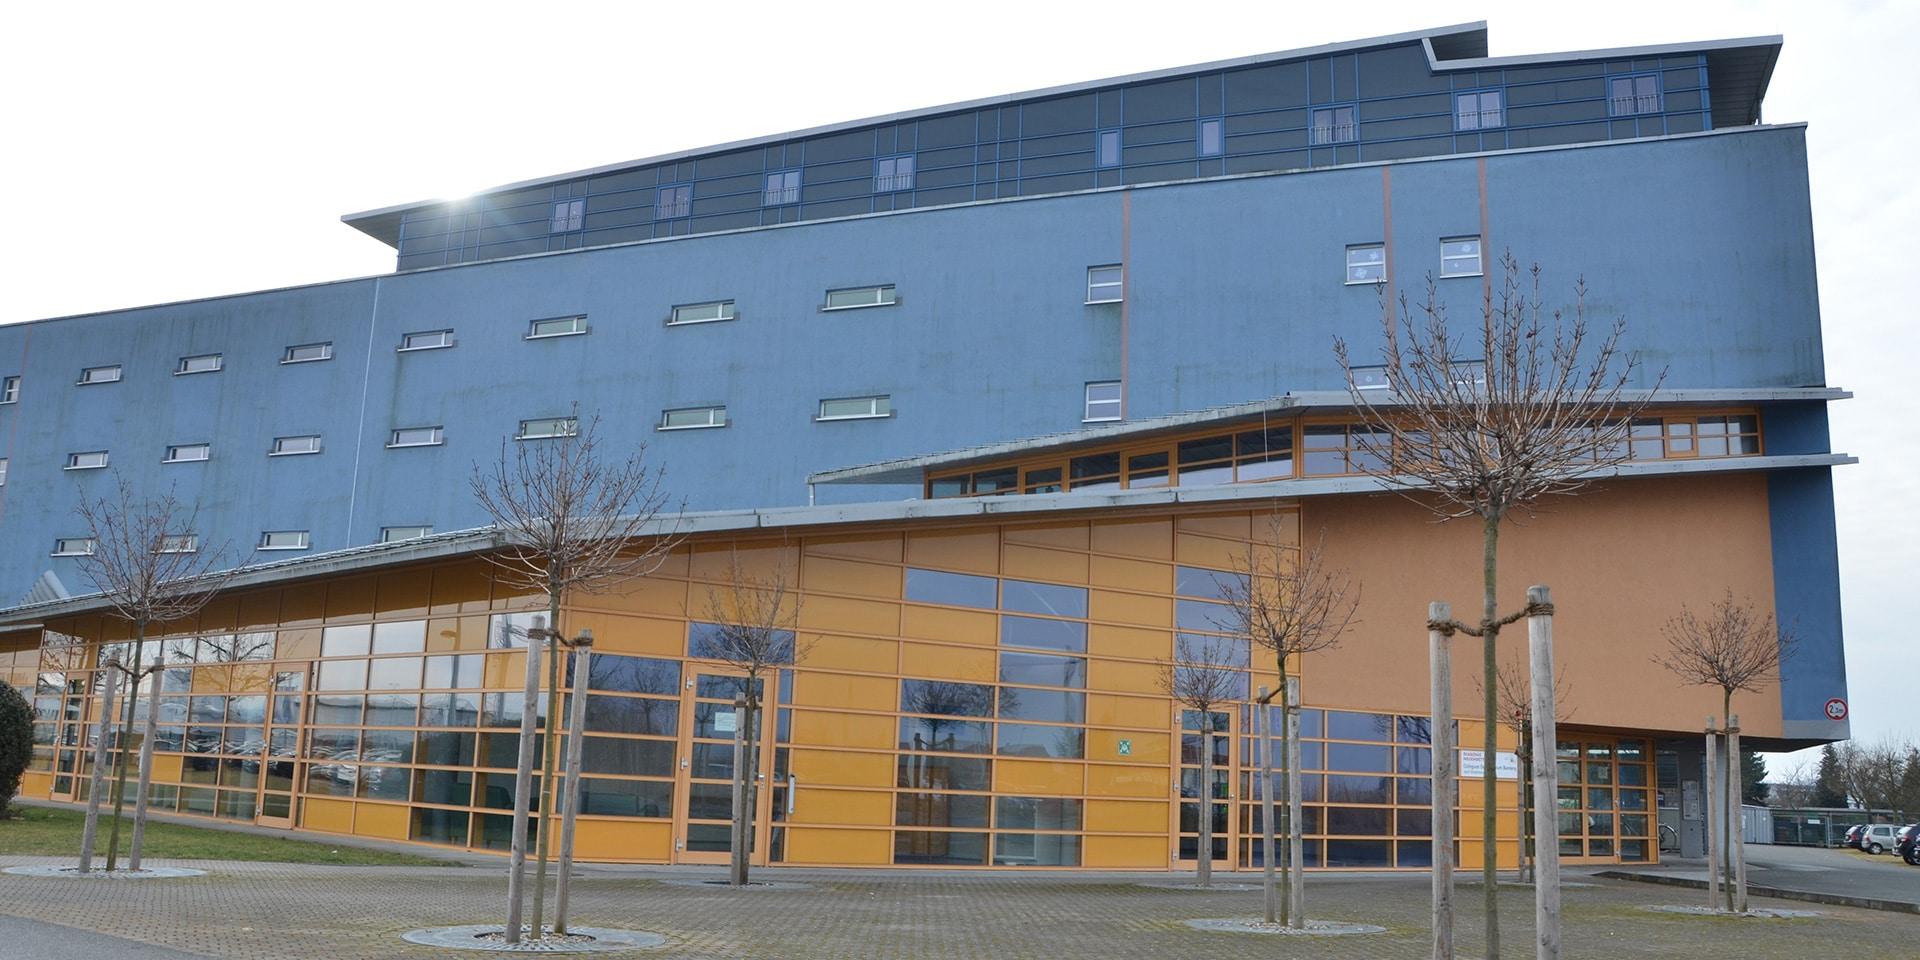 wohnheim collegium oecumenicum bamberg - Wohnheim Collegium Oecumenicum Bamberg